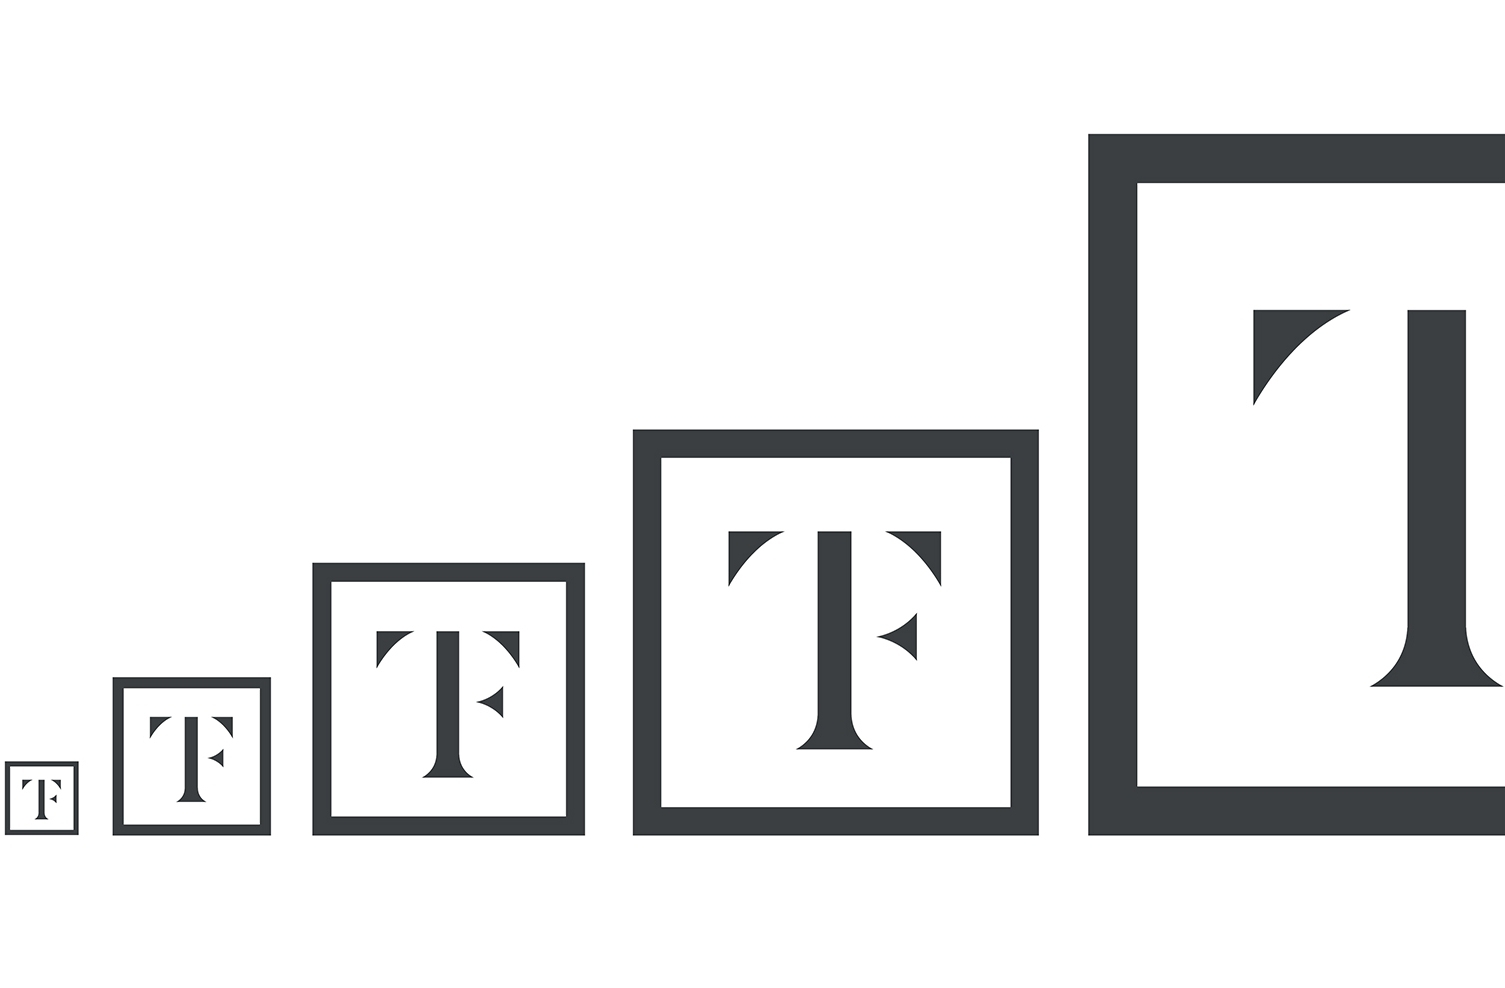 TF_Identity_Branding_V1_A7_w.jpg